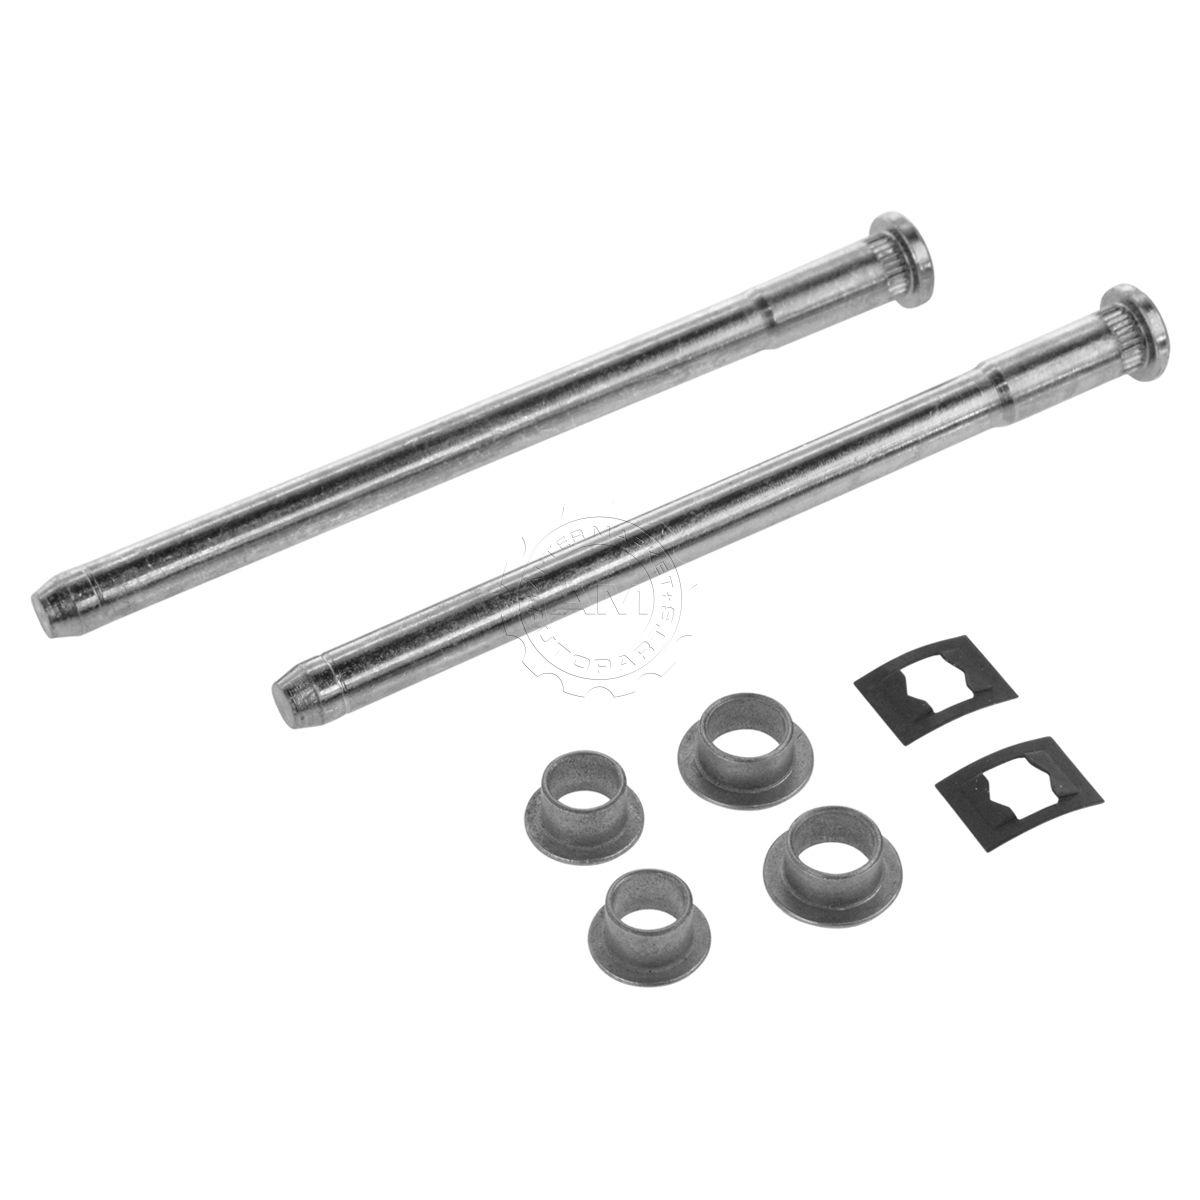 Dorman Front Door Hinge Pin & Bushing Kit for 96-12 Chevy